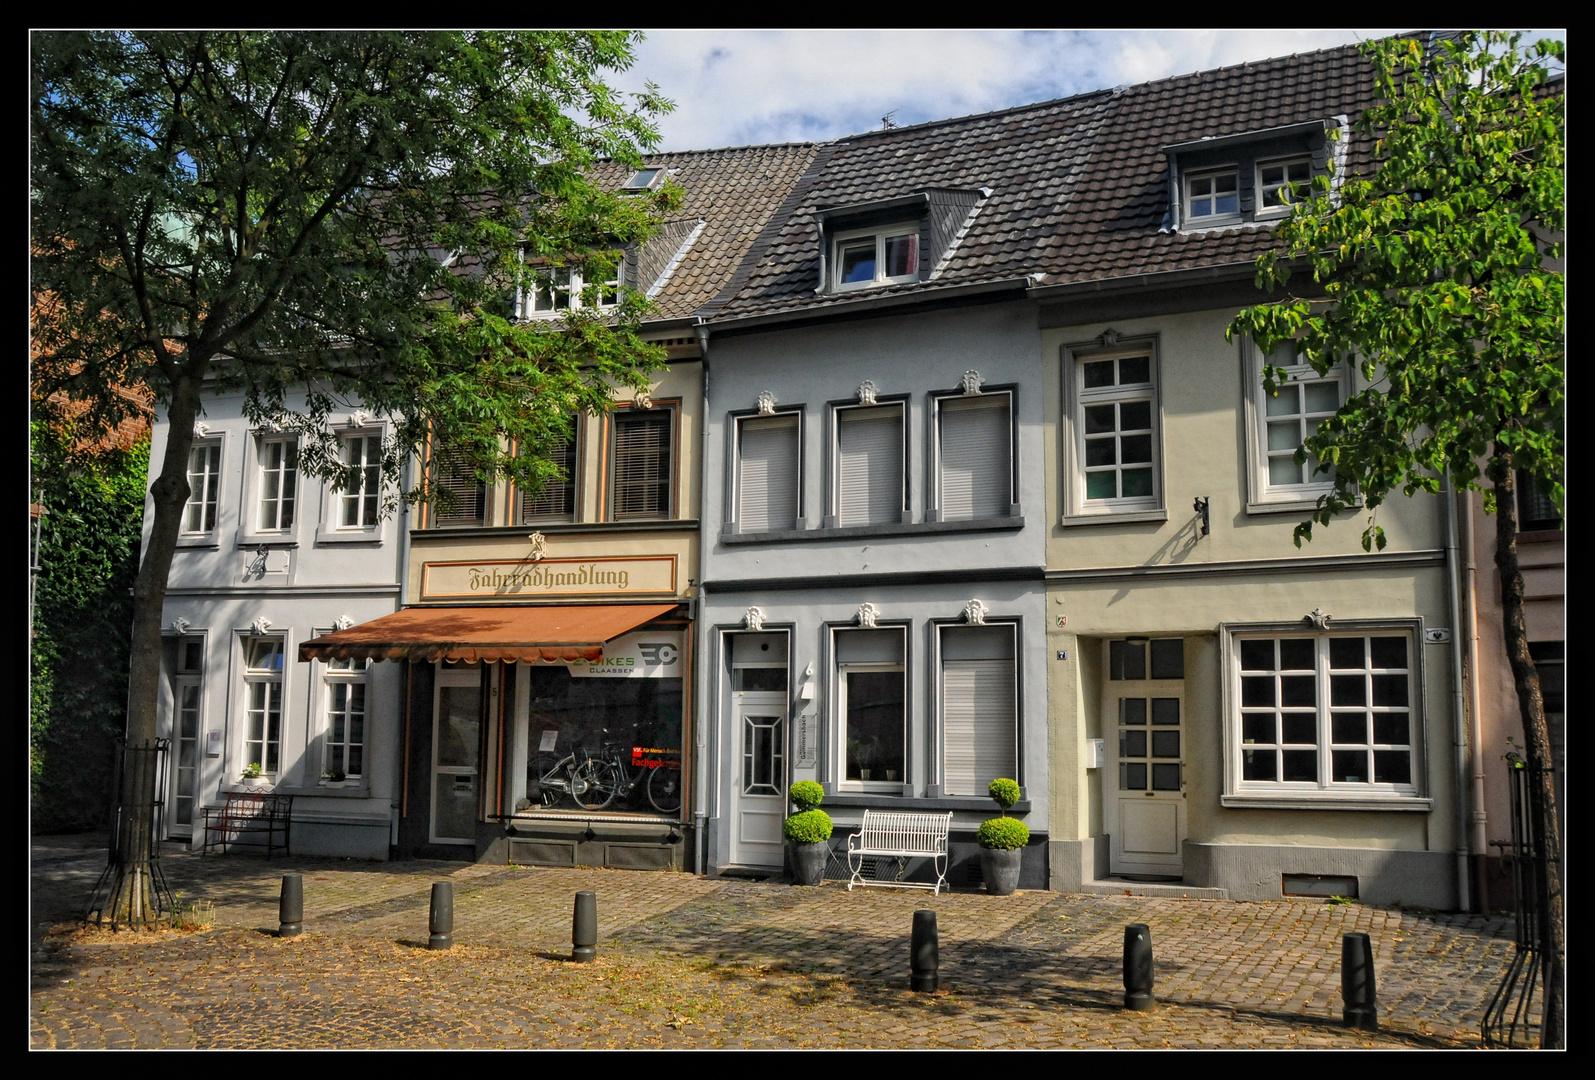 Kleinstadt-Idylle